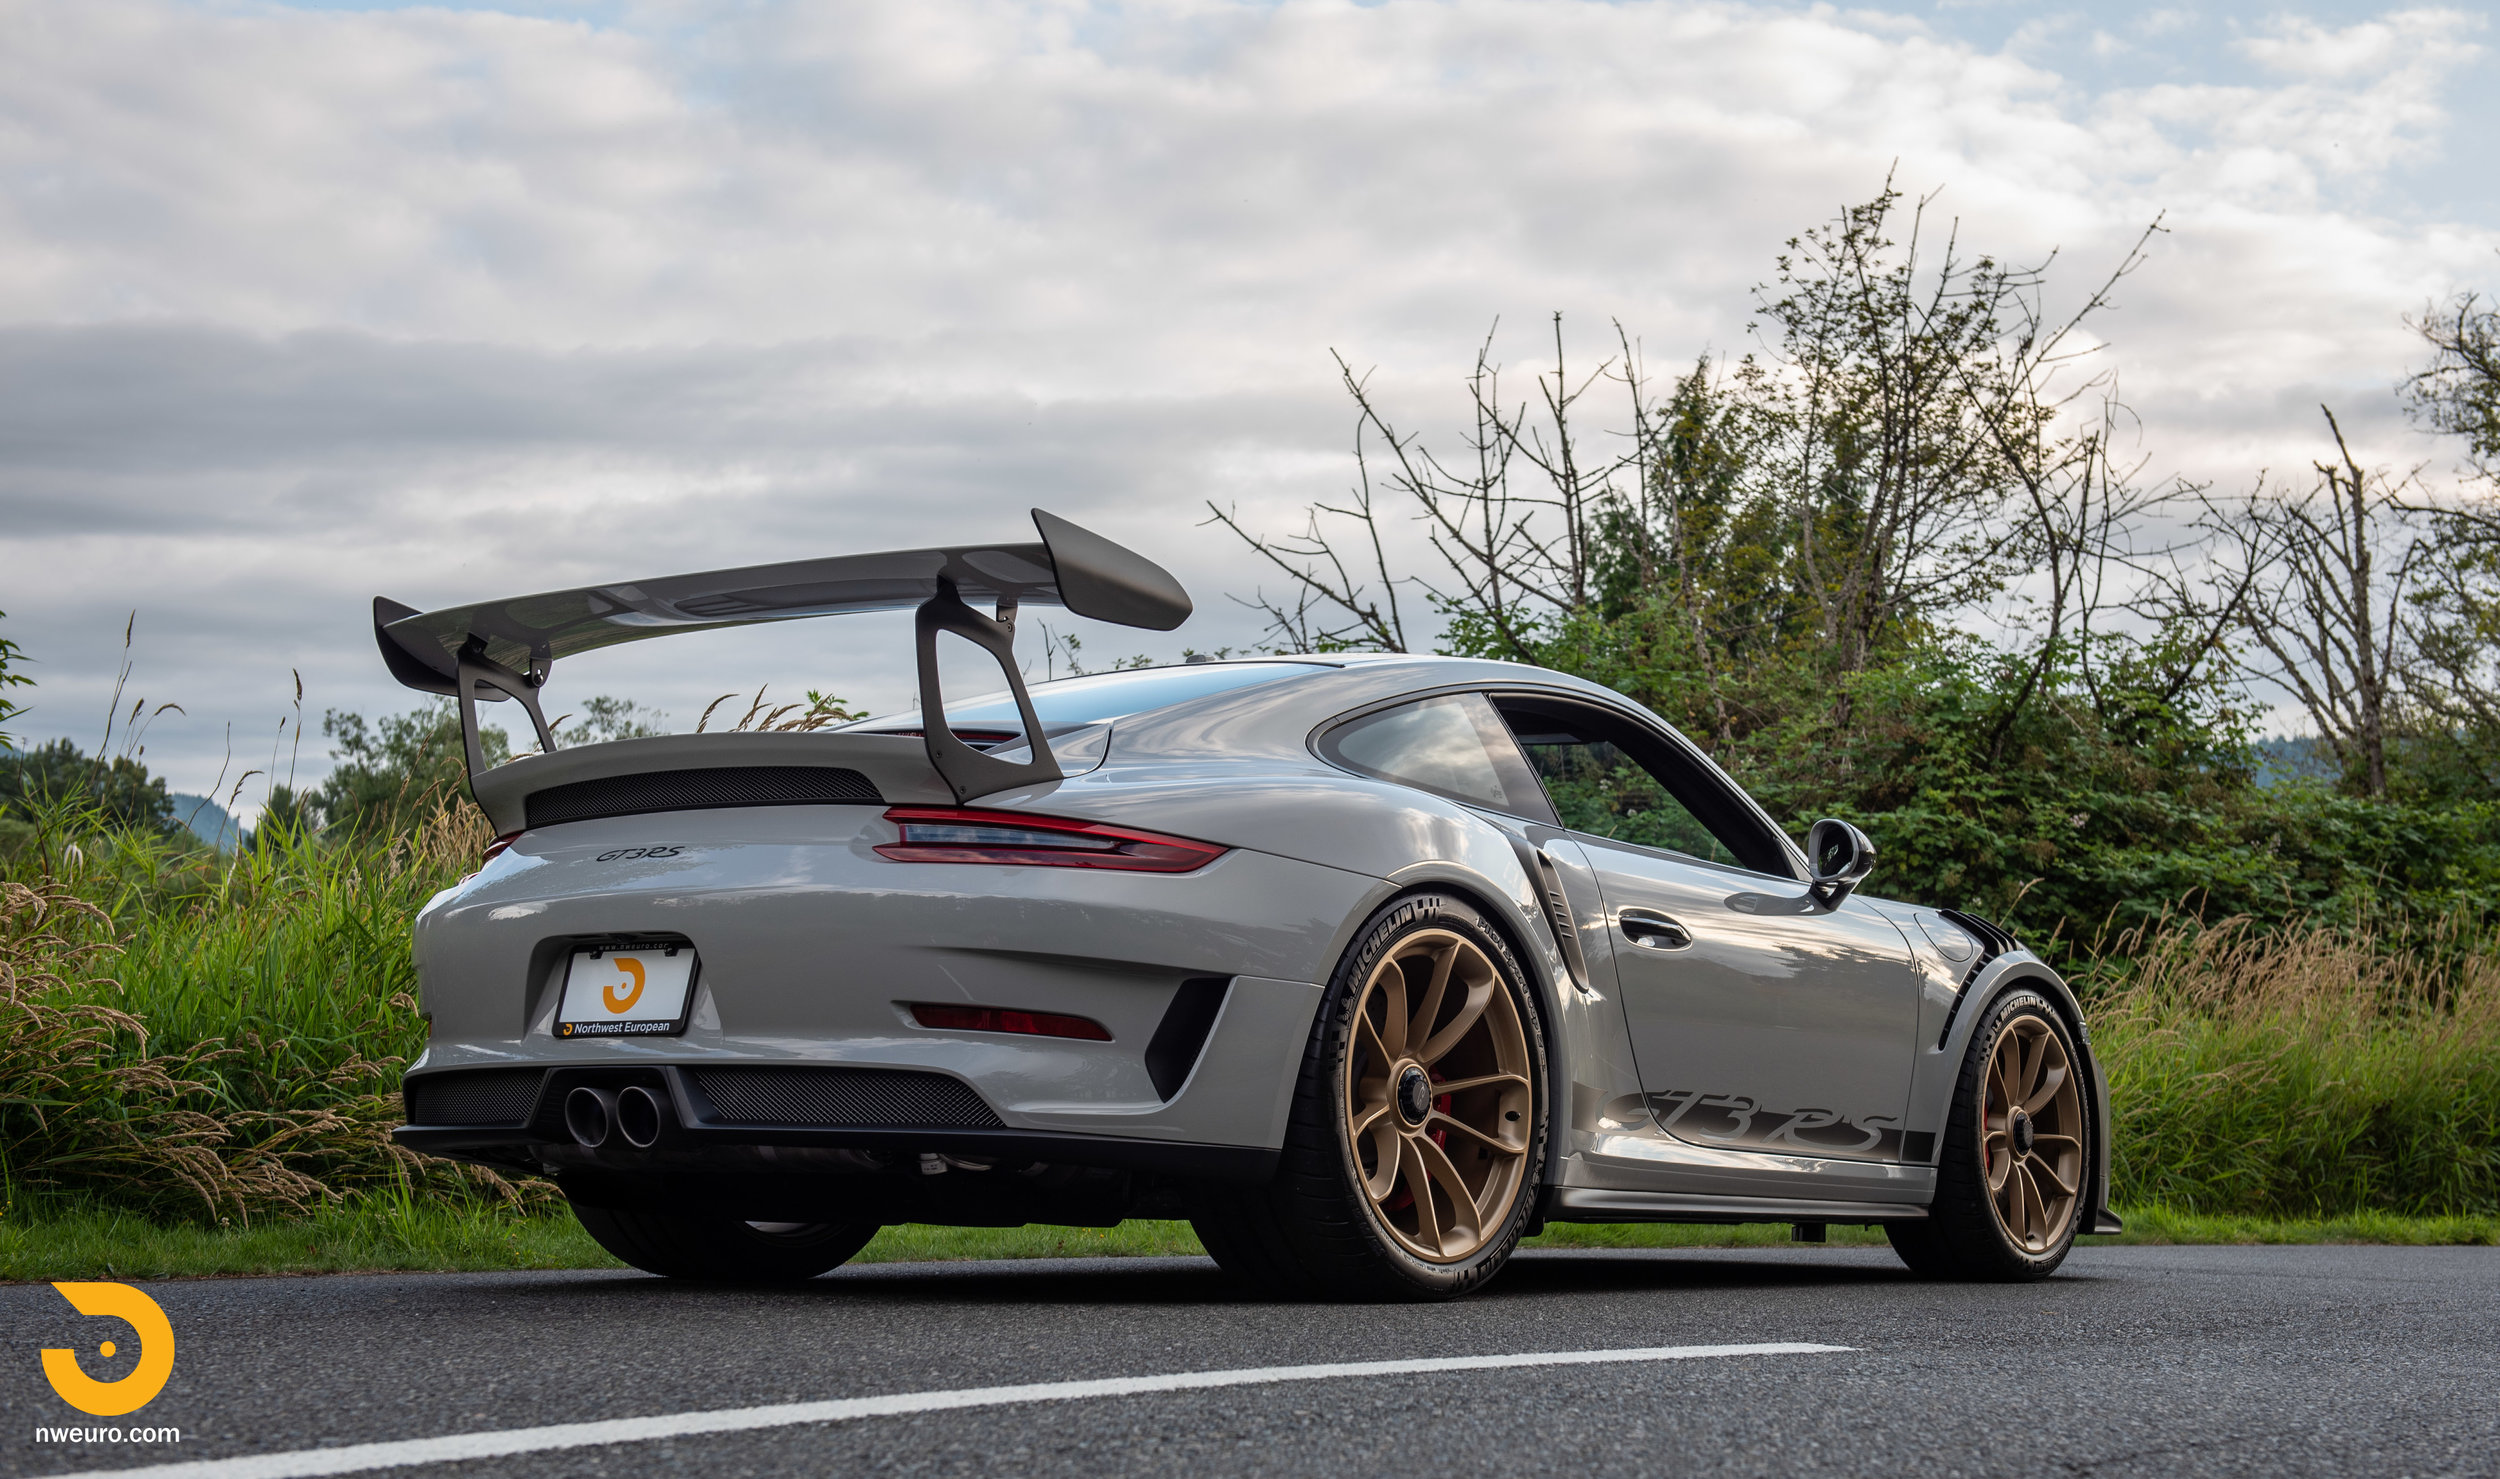 2019 Porsche GT3 RS - Chalk-70.jpg